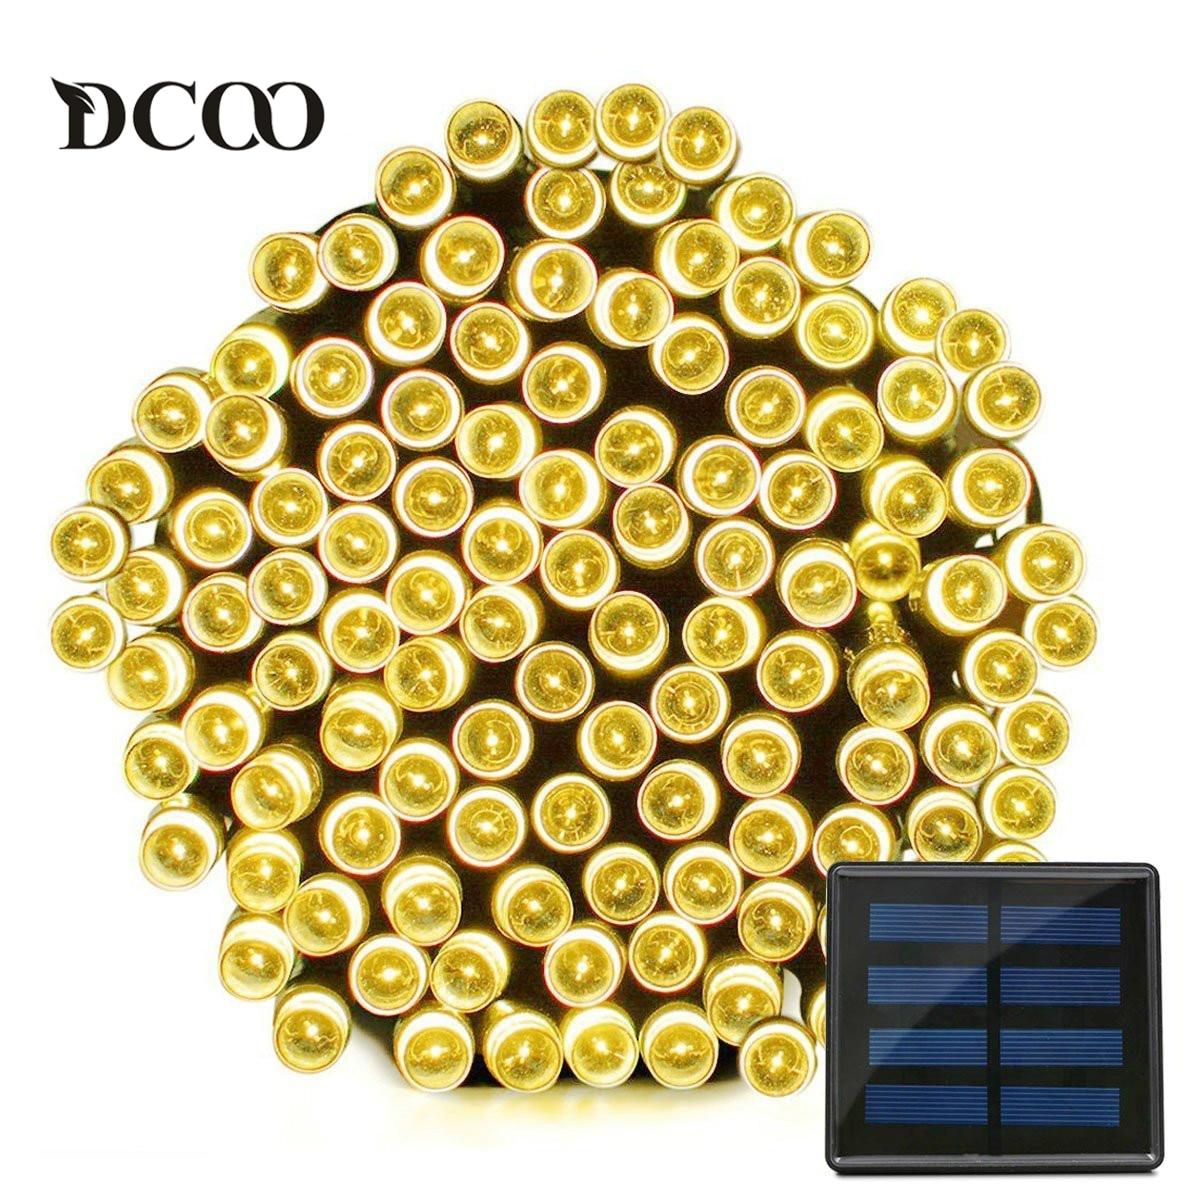 Dcoo Solar LED String Lights 22meter 200 LEDs Waterproof 8 Modes Fairy Christmas Lights Outdoor Lighitng